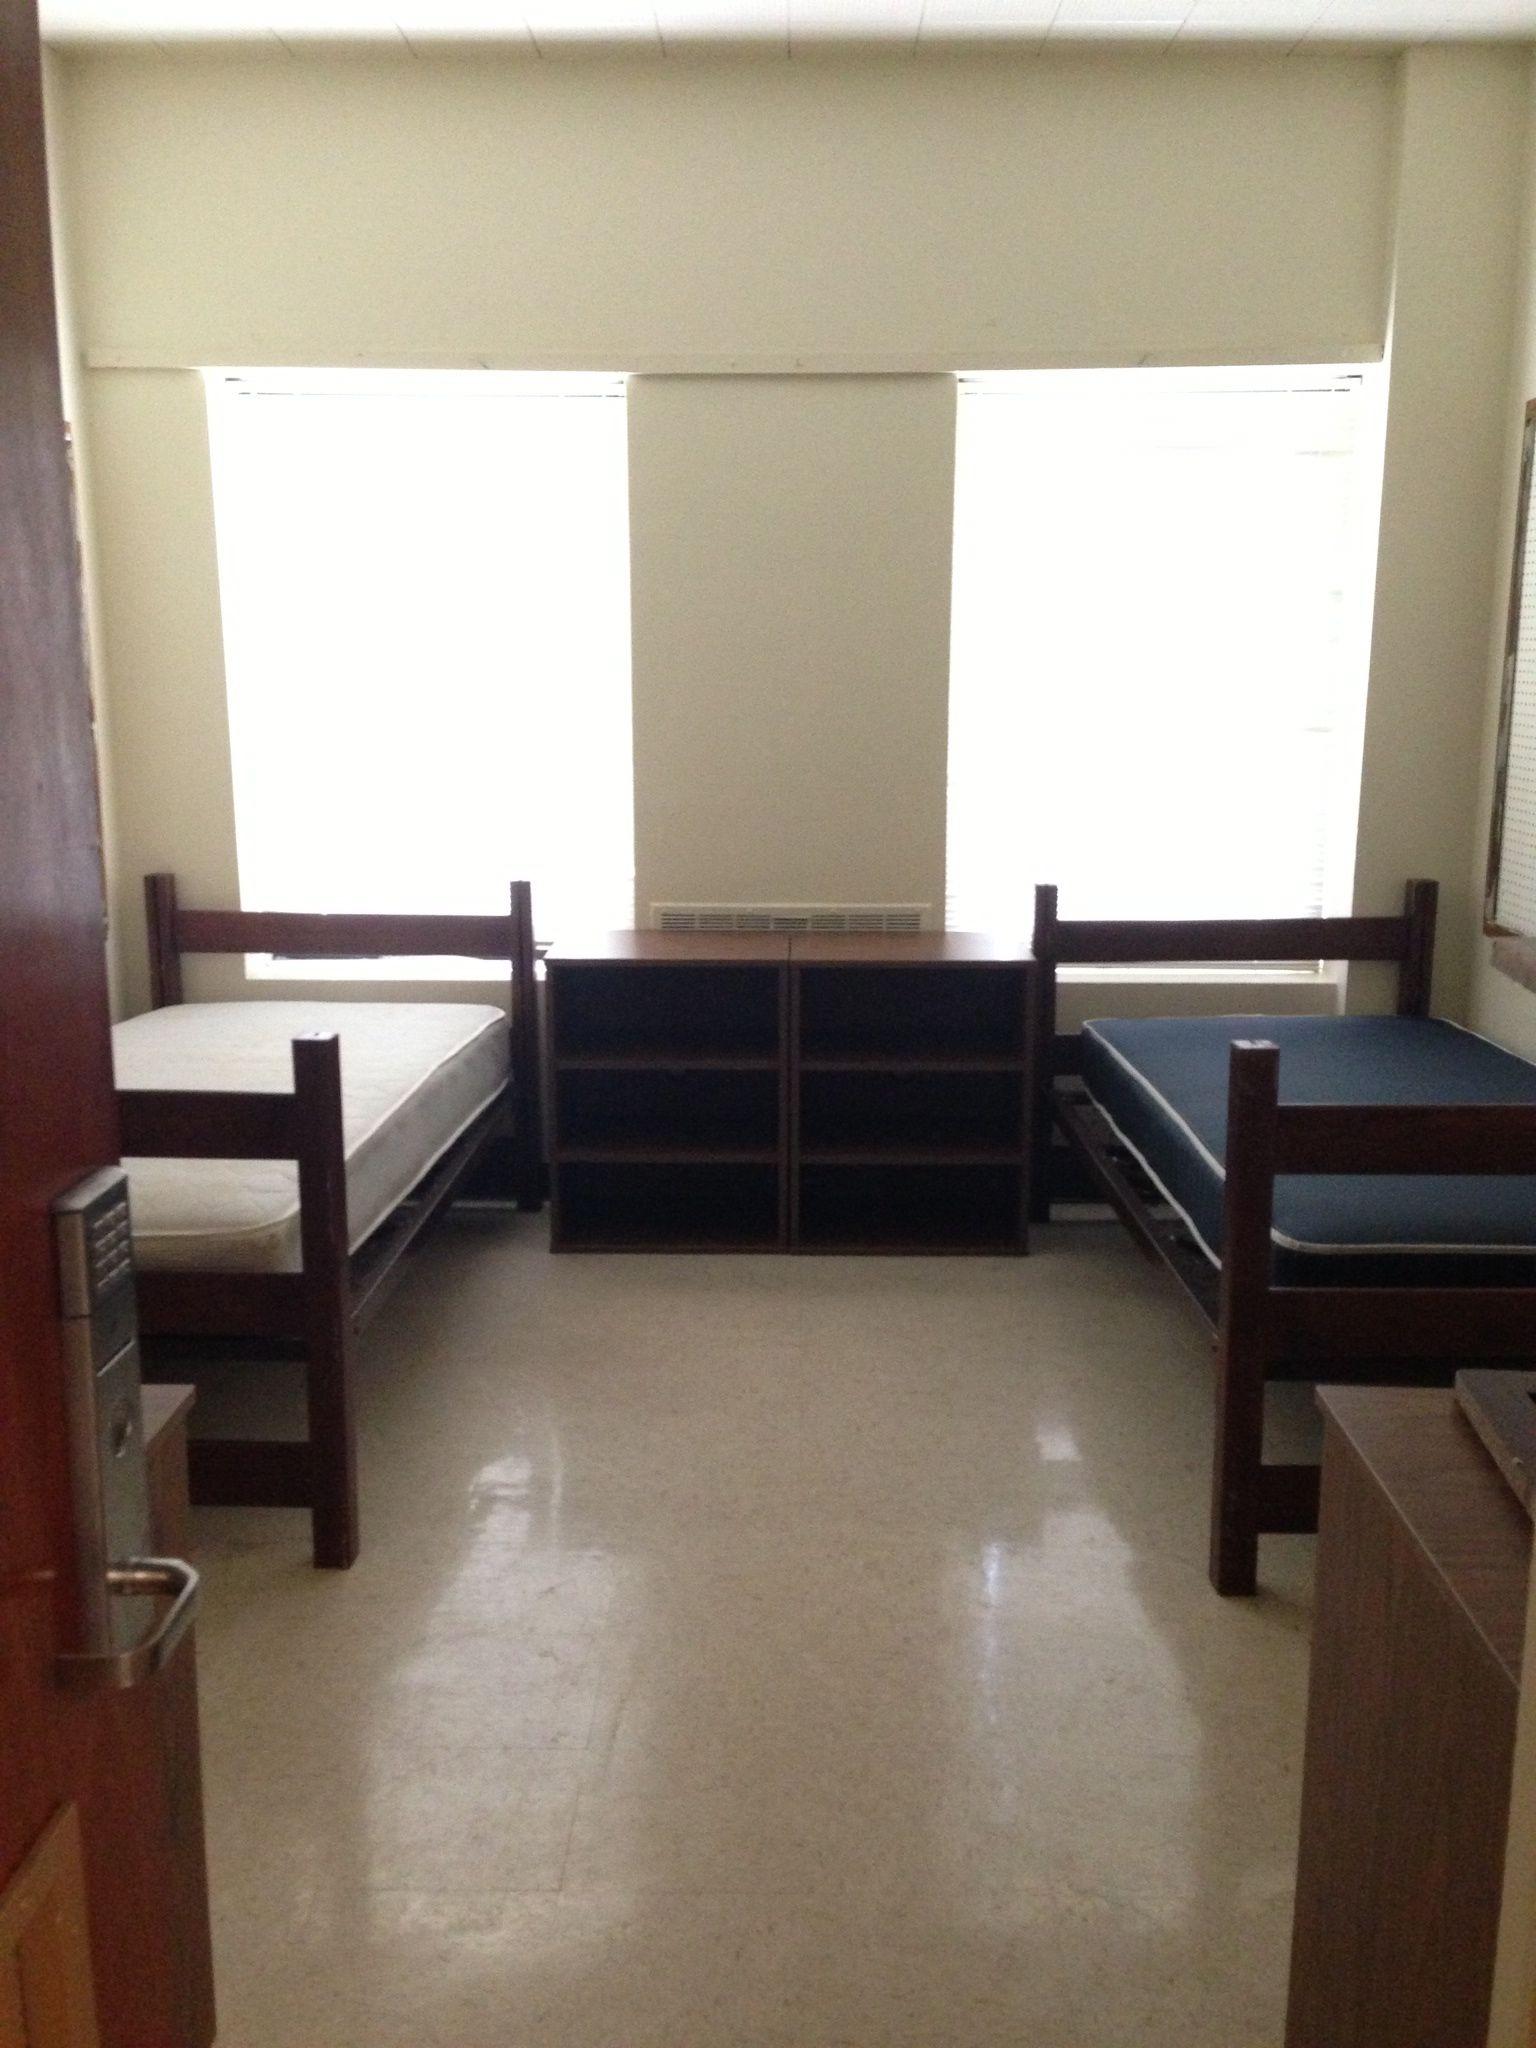 Apartment Dorm Room At Baylor University Baylor Dorm Rooms Baylor University Dorm Baylor Dorm